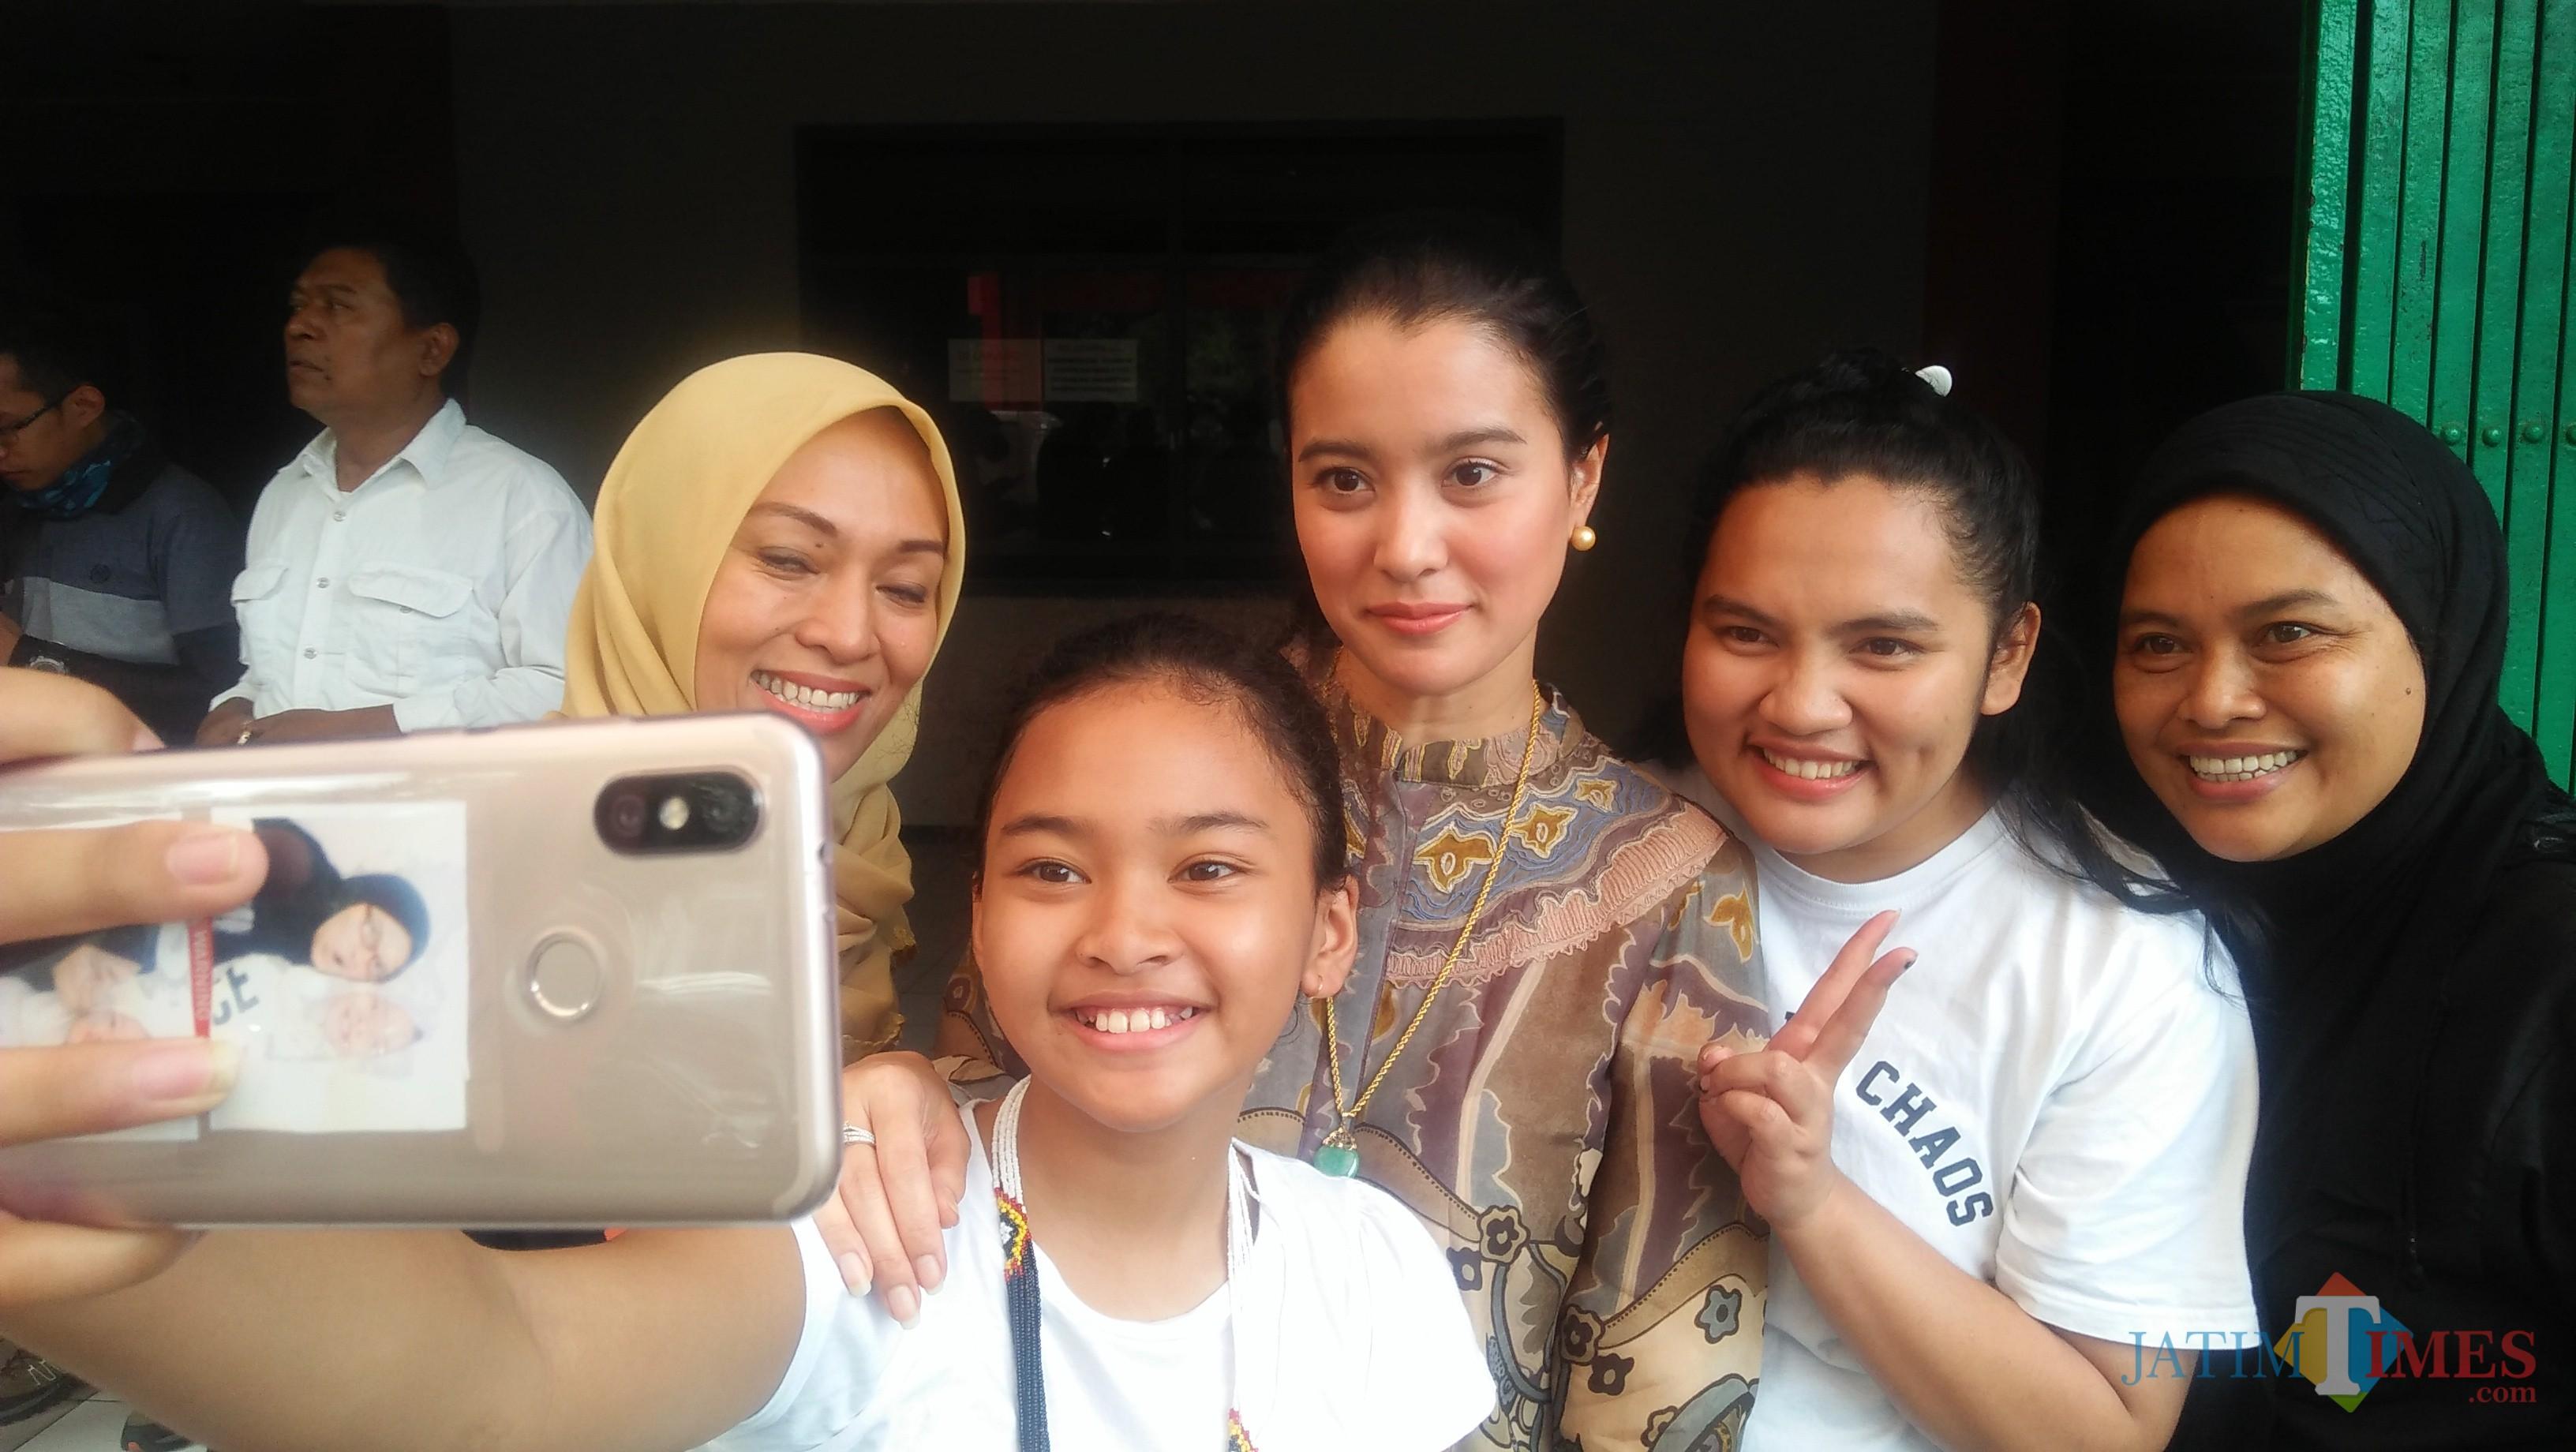 Marcella Zalianty berselfie dengan fans nya (Luqmanul Hakim/Malang Times)